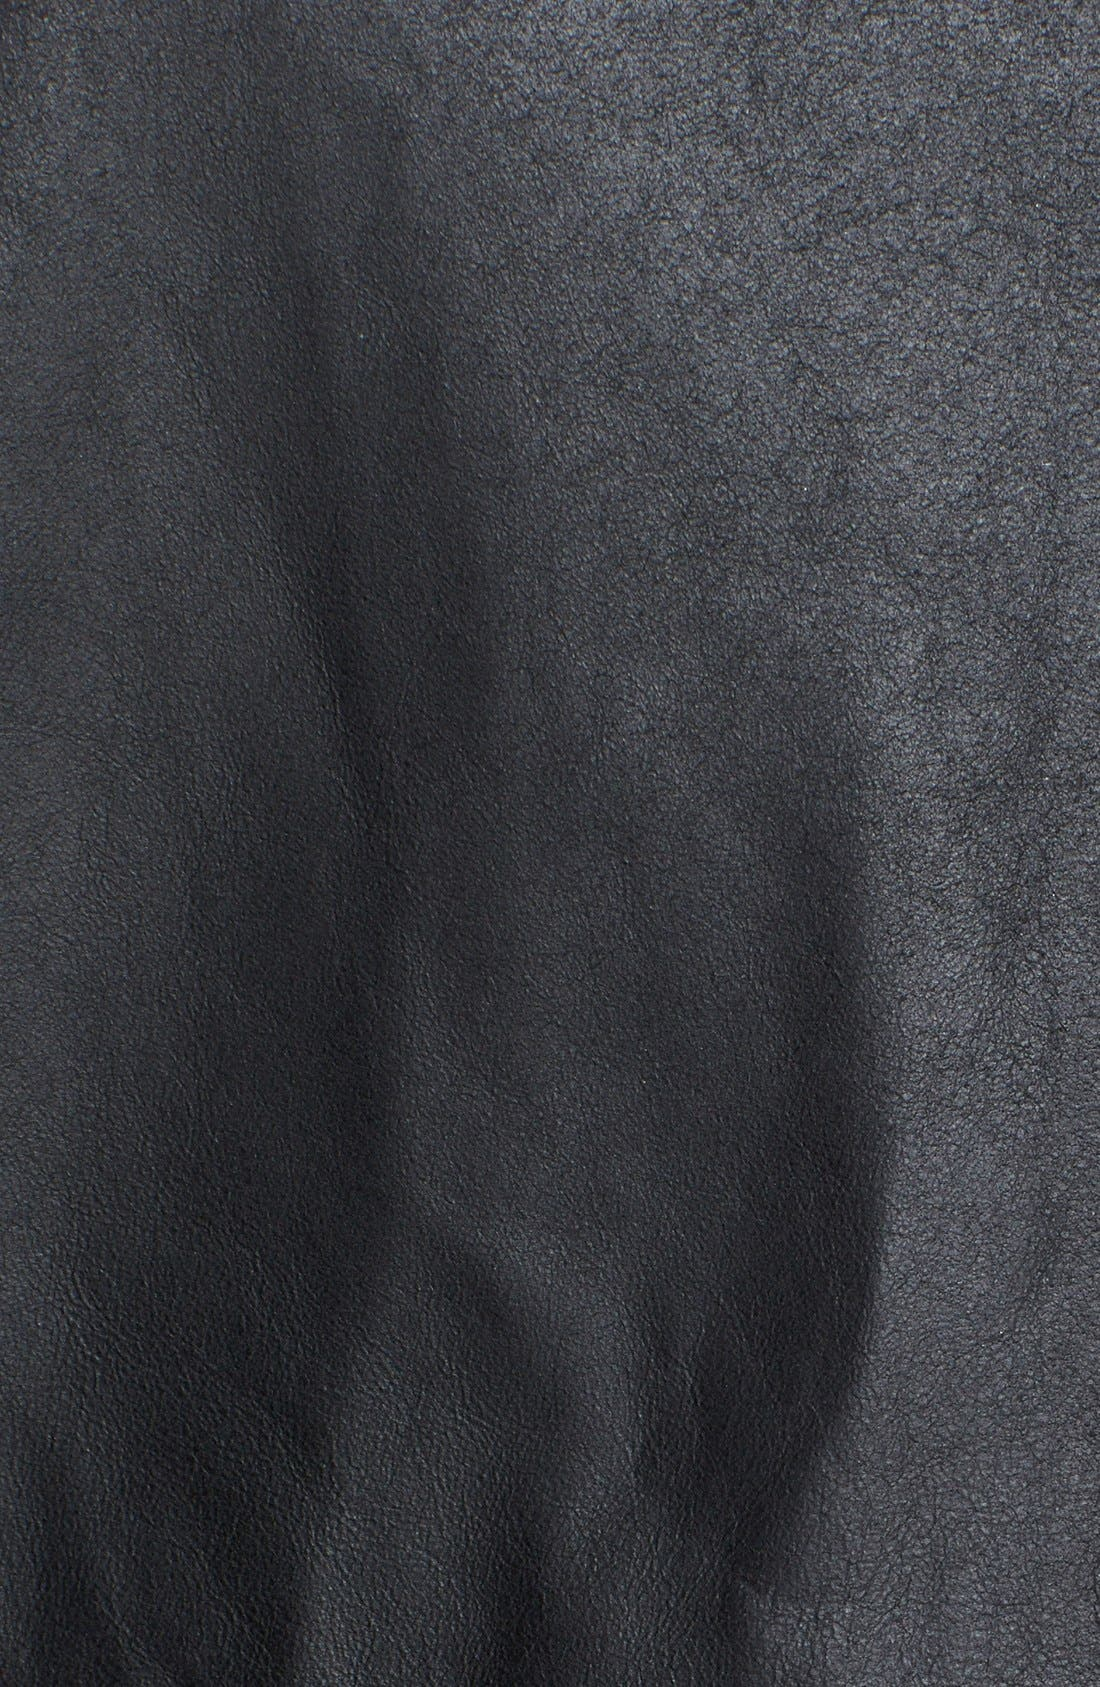 Alternate Image 3  - Equipment 'Kyle' Leather & Silk Top